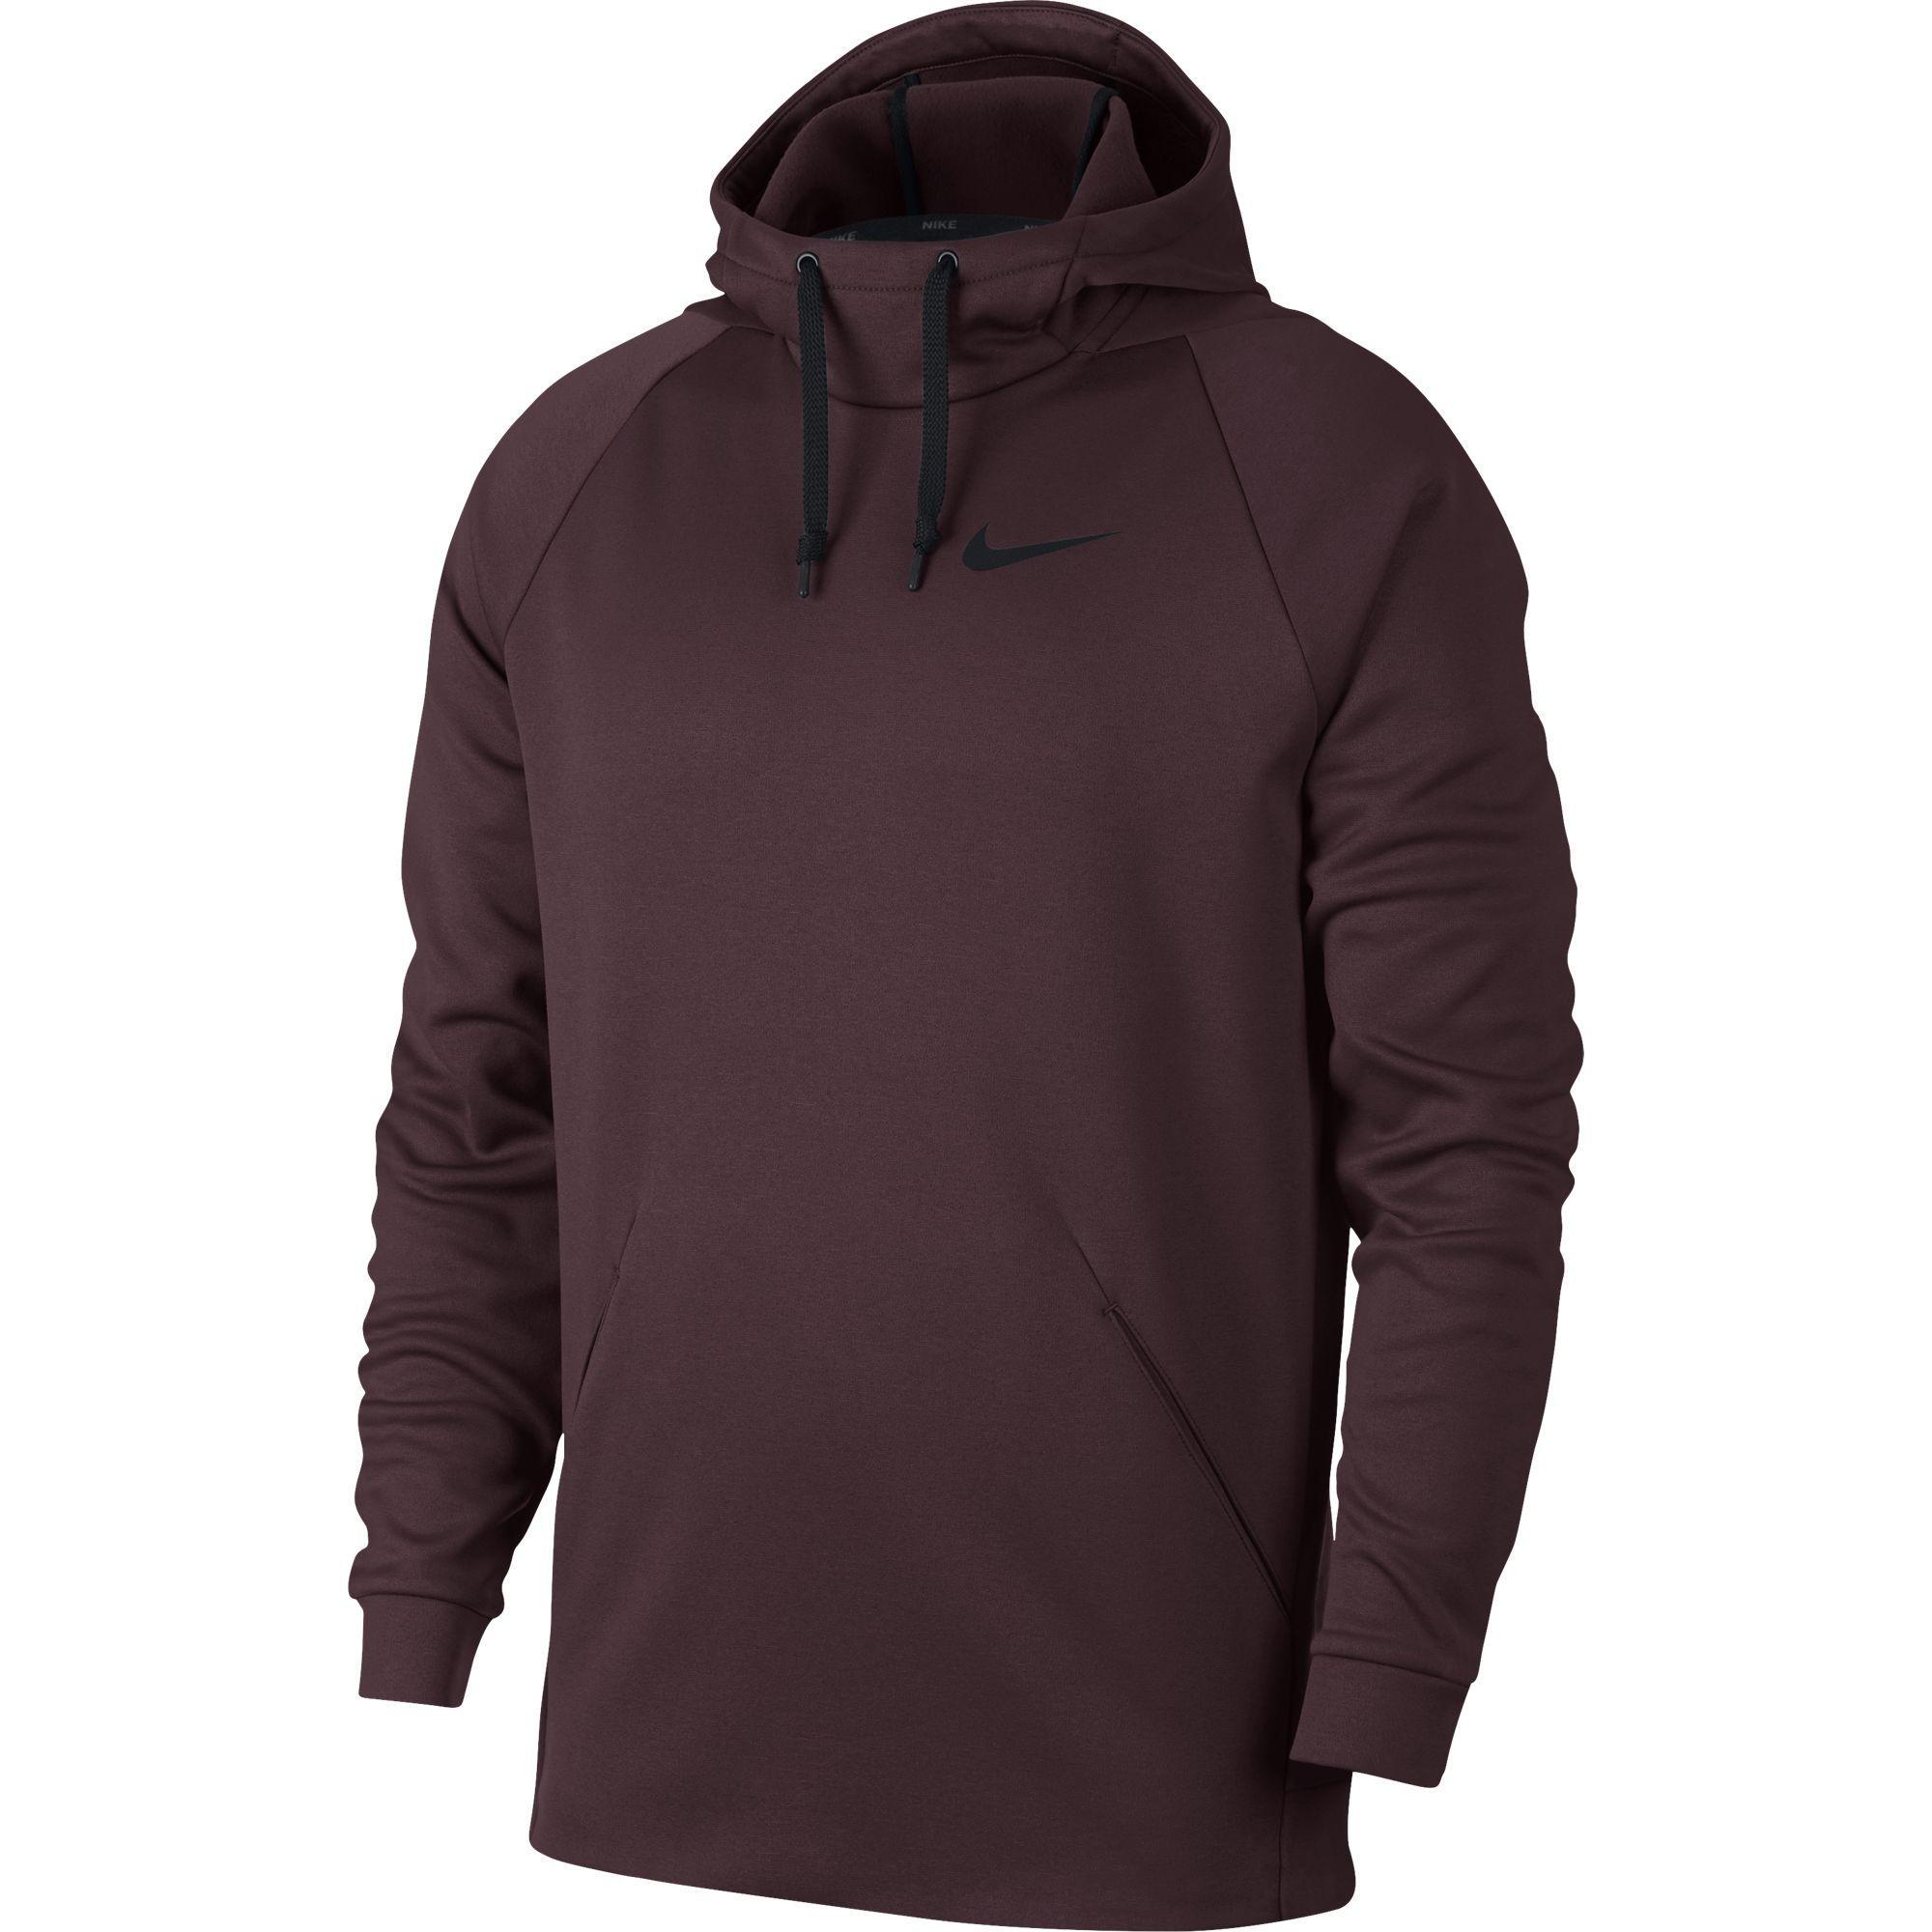 Nike Mens Dry Training Hoodie - Burgundy Crush Black - Tennisnuts.com 1505d3c1b